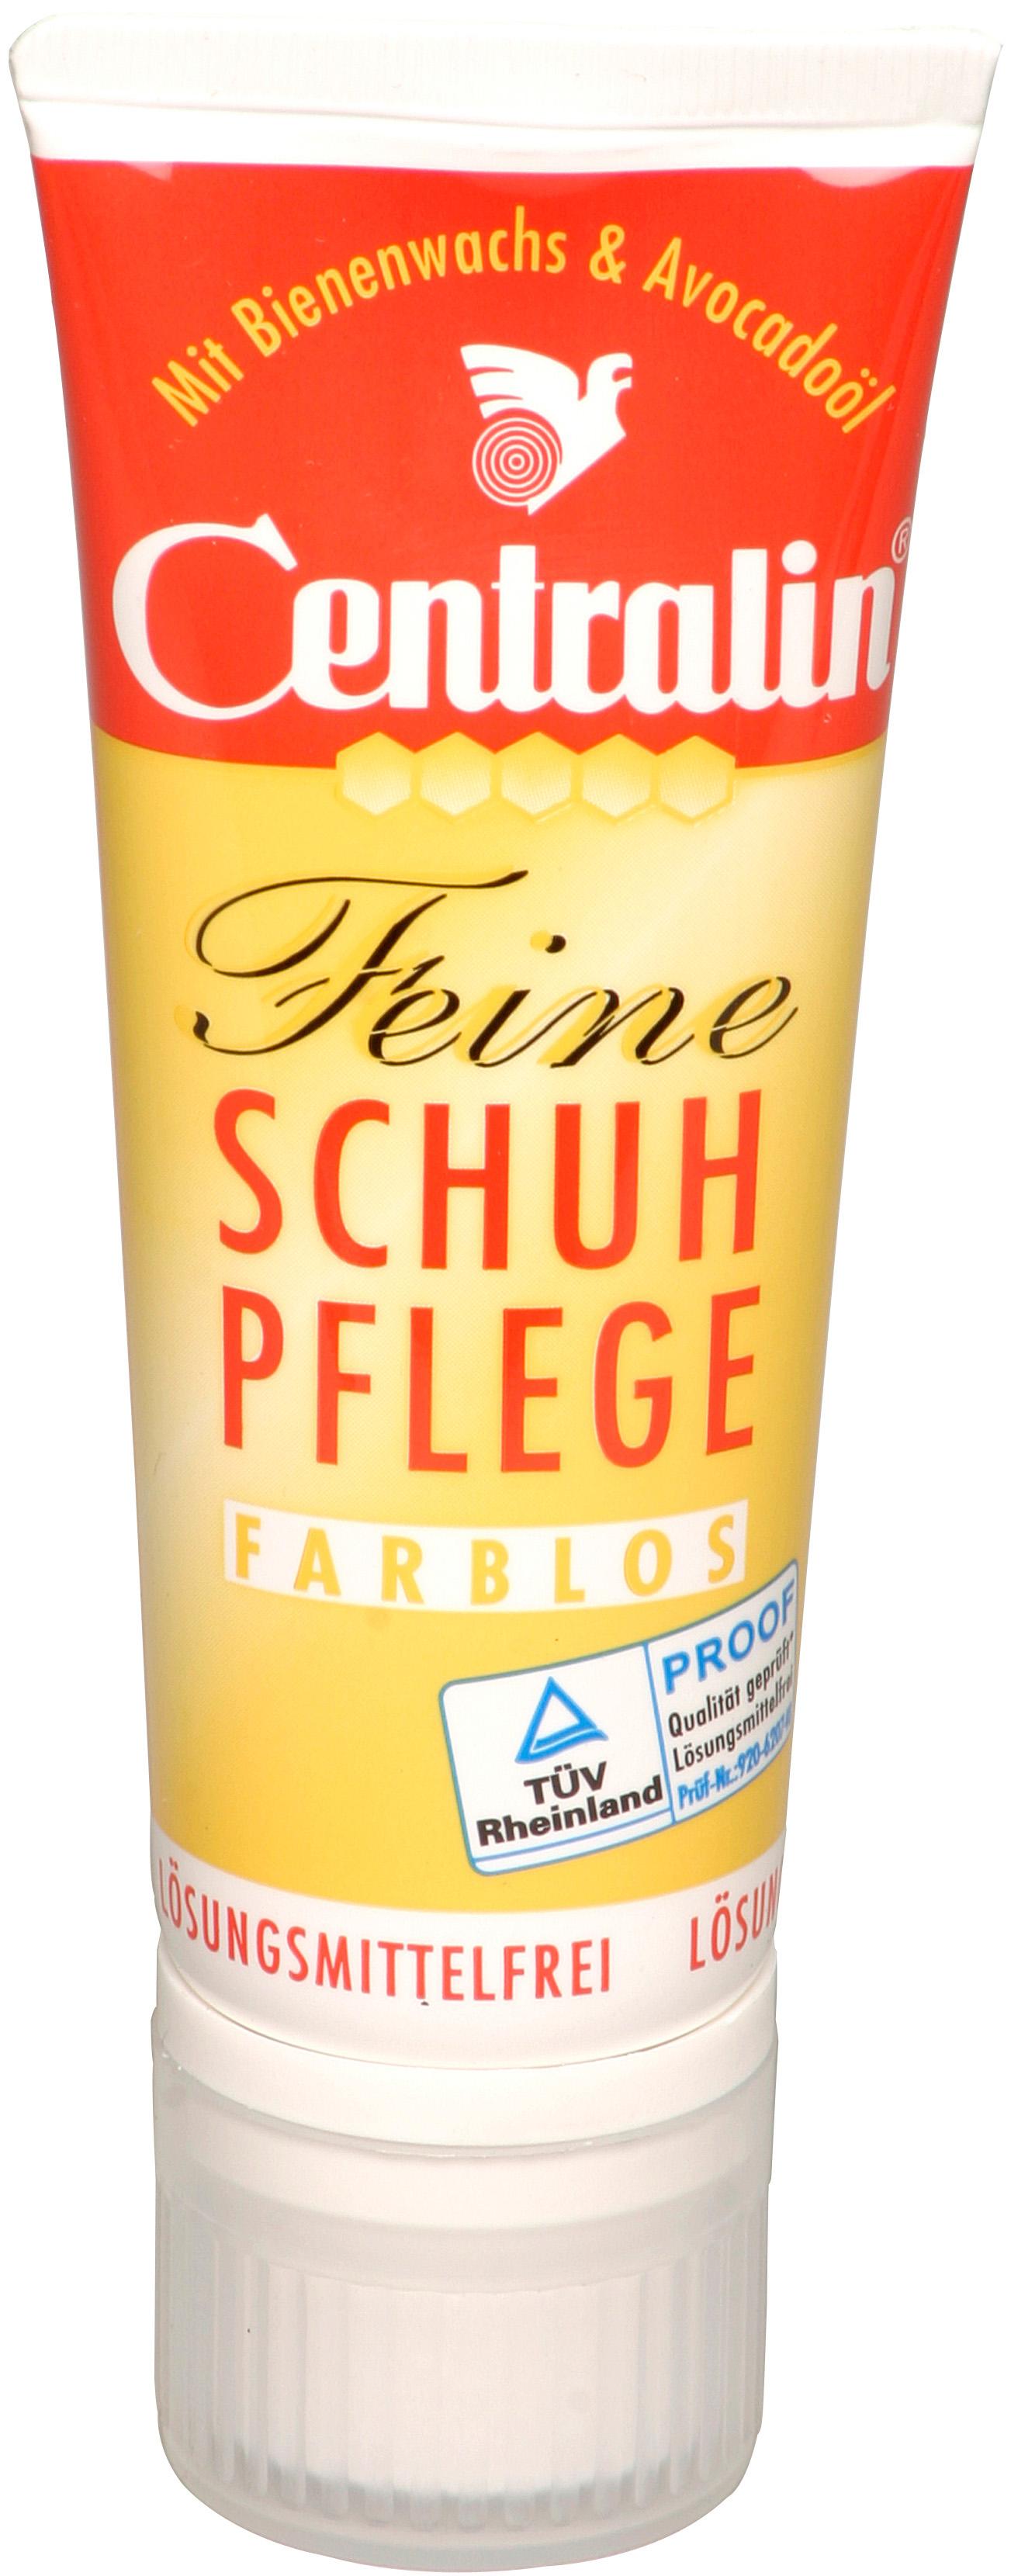 00674 - Centralin Schuhcreme 75 ml Tube -farblos-